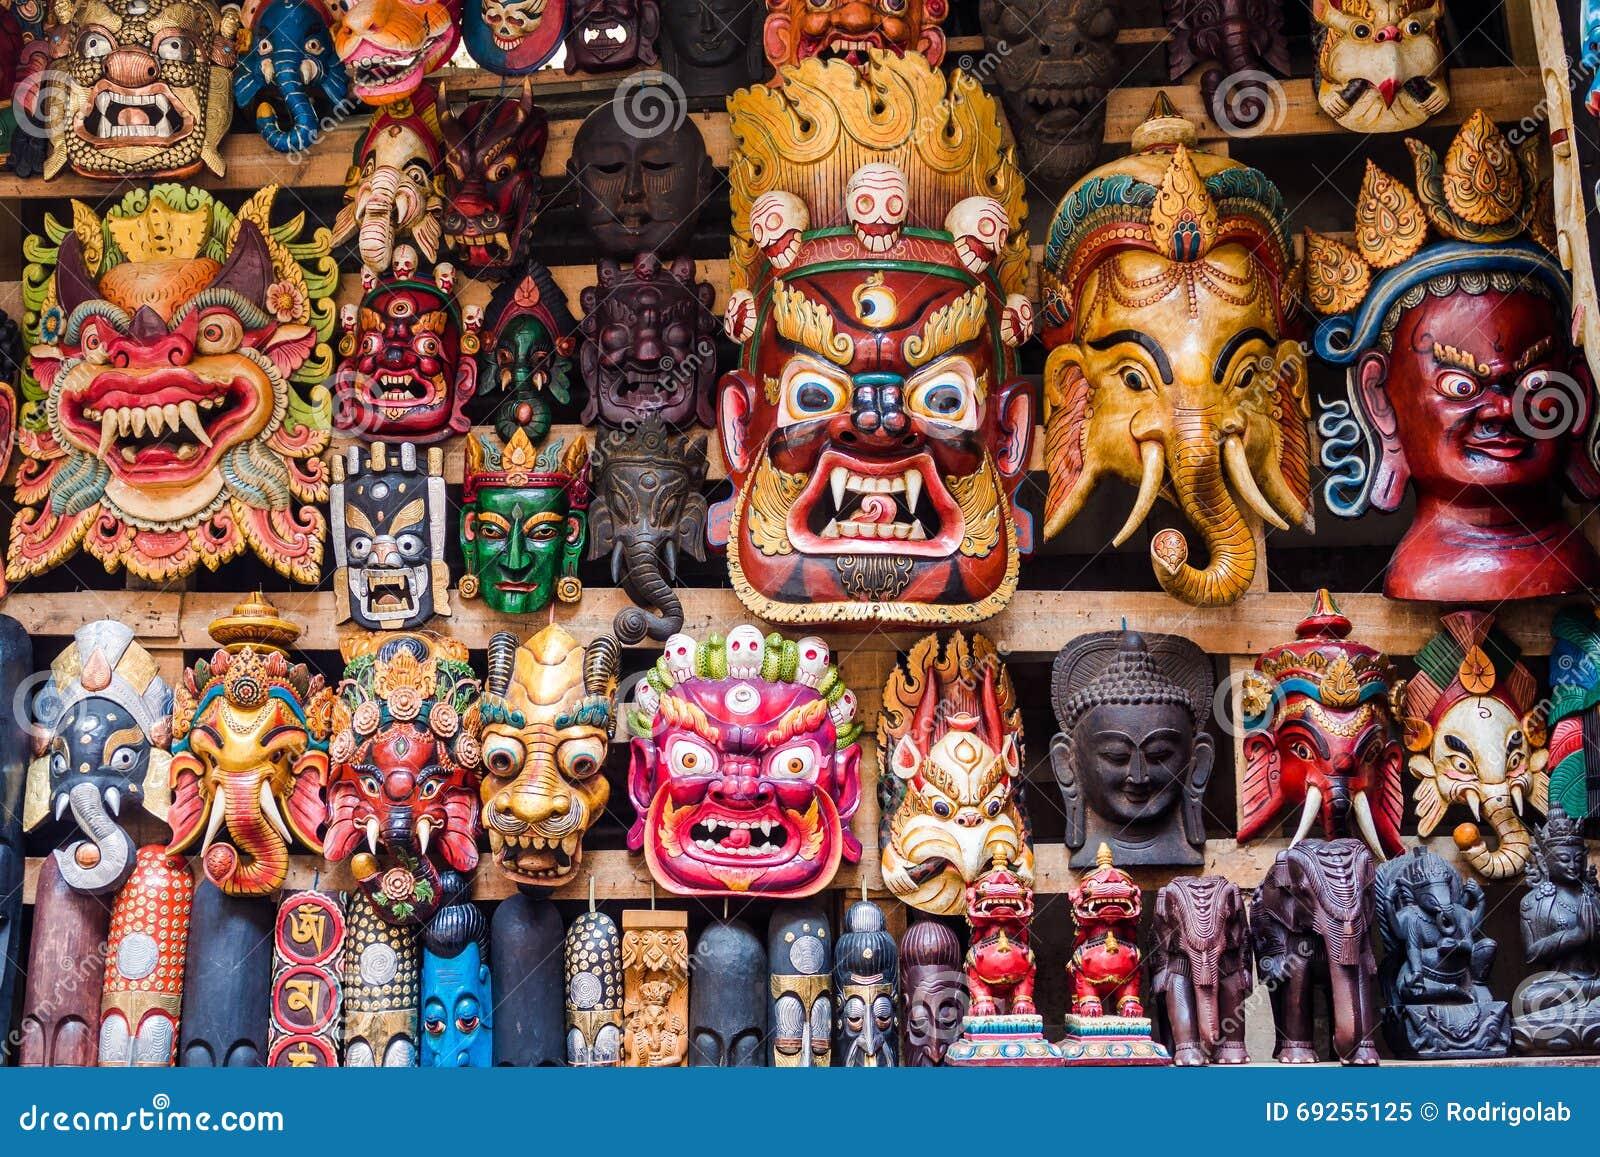 Colorful Masks At Shop In Kathmandu Nepal Stock Image Image Of